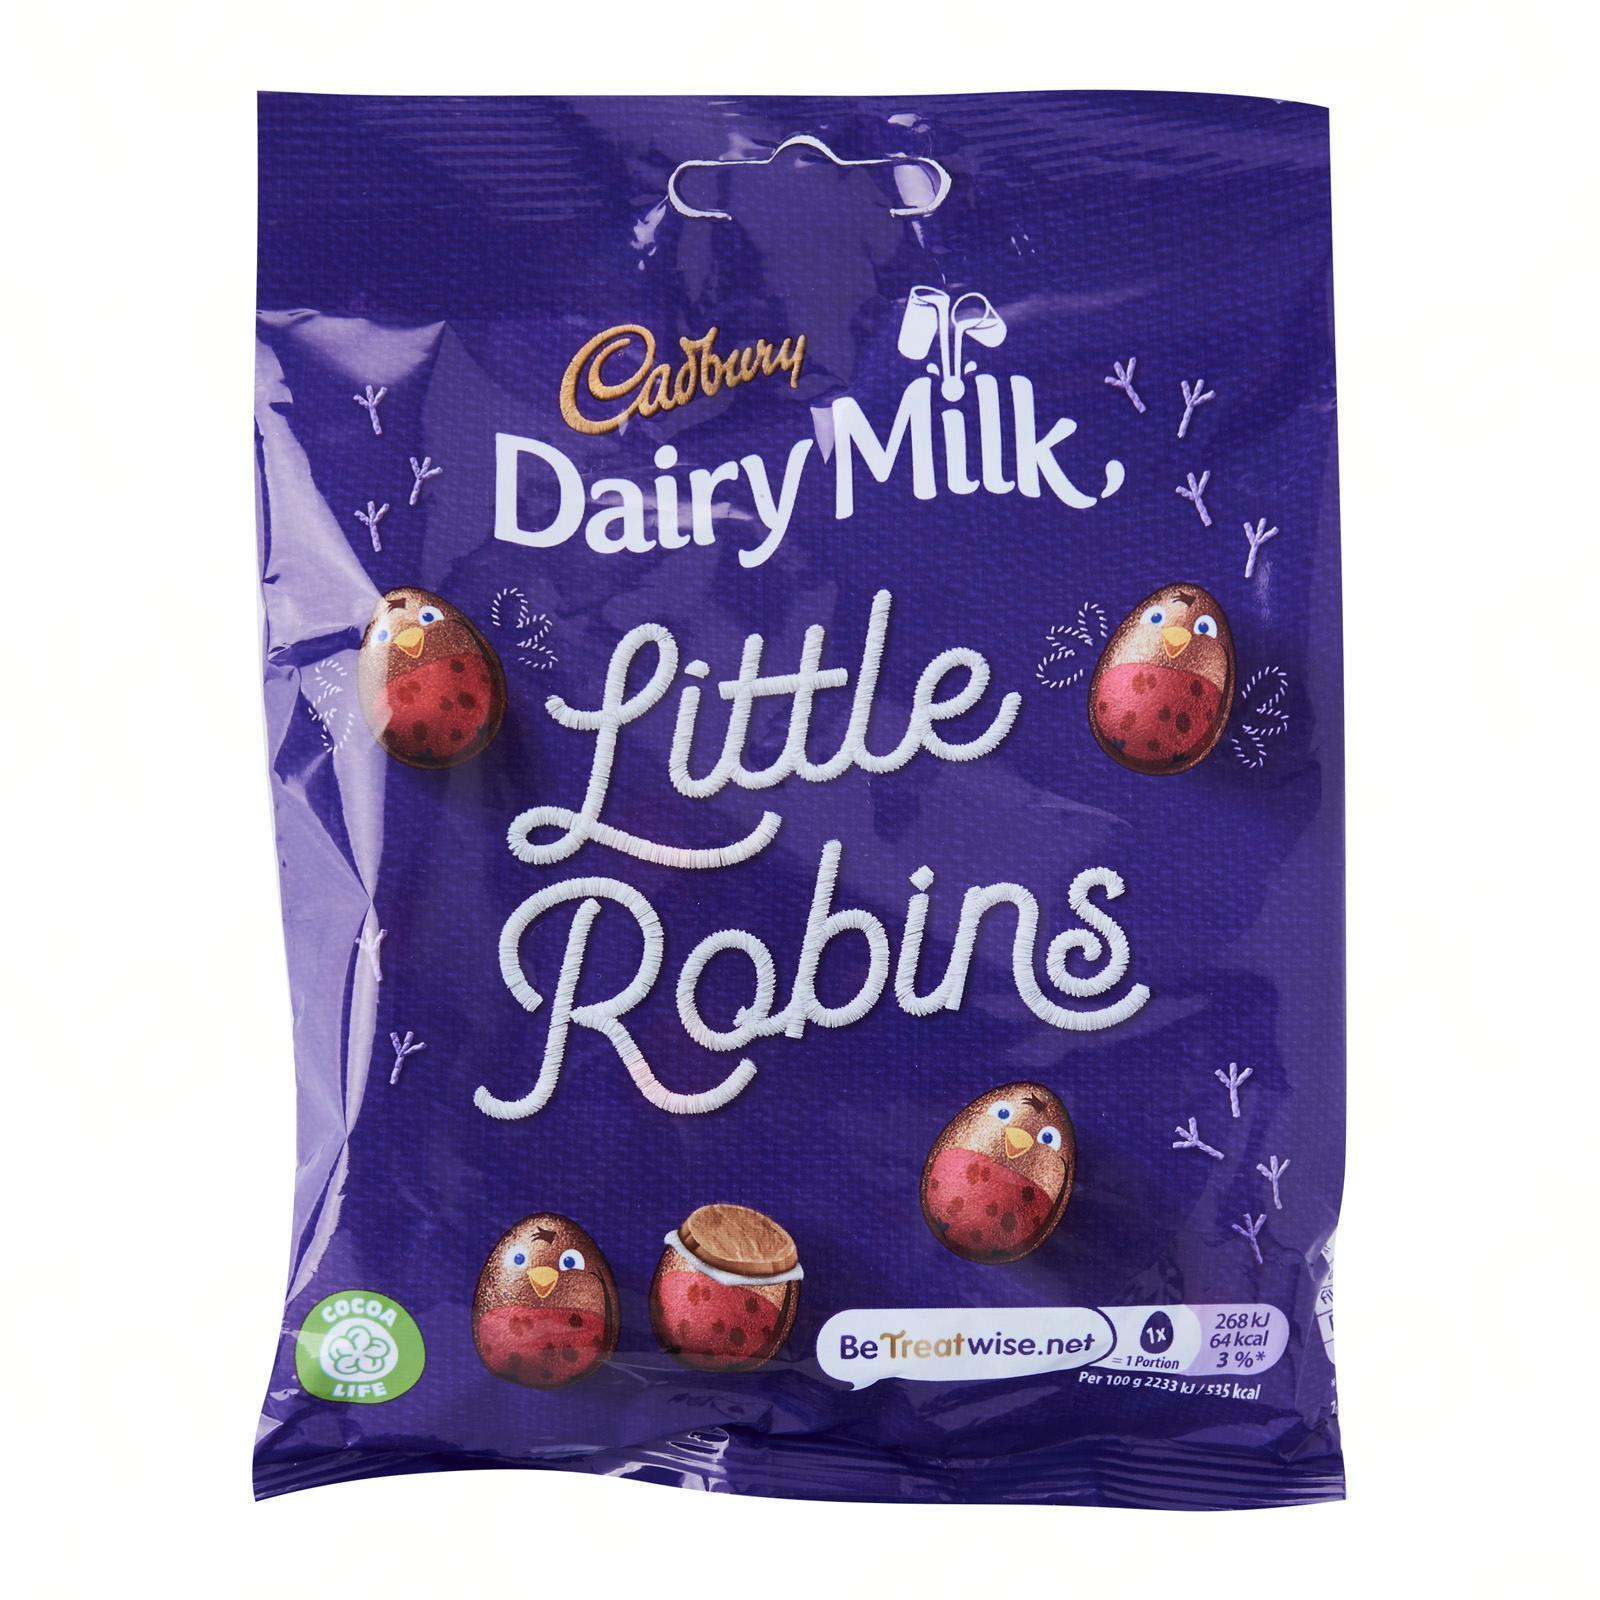 CADBURY Dairy Milk Little Robins Bag - Christmas Special